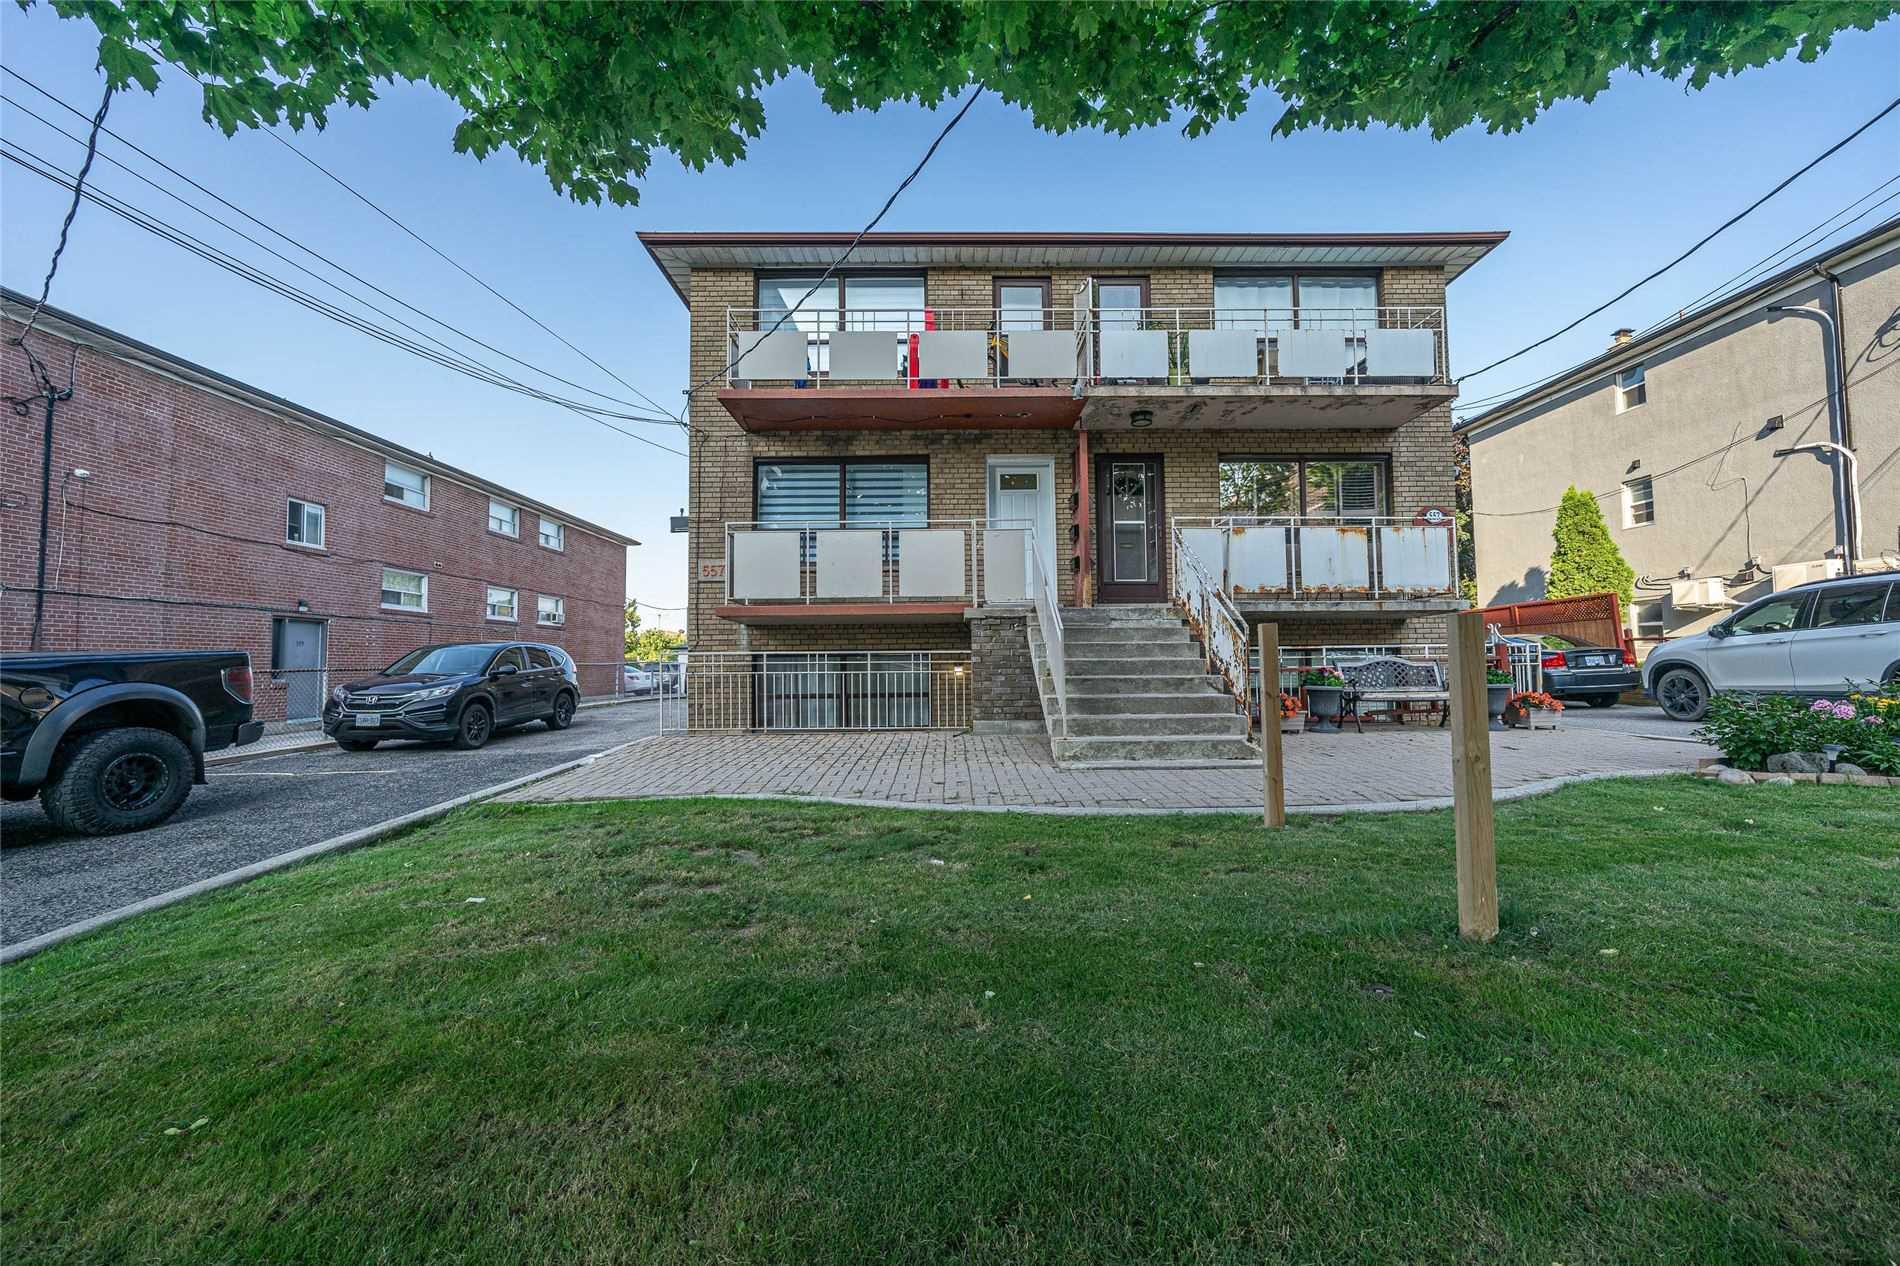 557 A Birchmount Rd, Toronto, Ontario M1K1P8, 5 Bedrooms Bedrooms, 14 Rooms Rooms,3 BathroomsBathrooms,Triplex,For Sale,Birchmount,E5338160